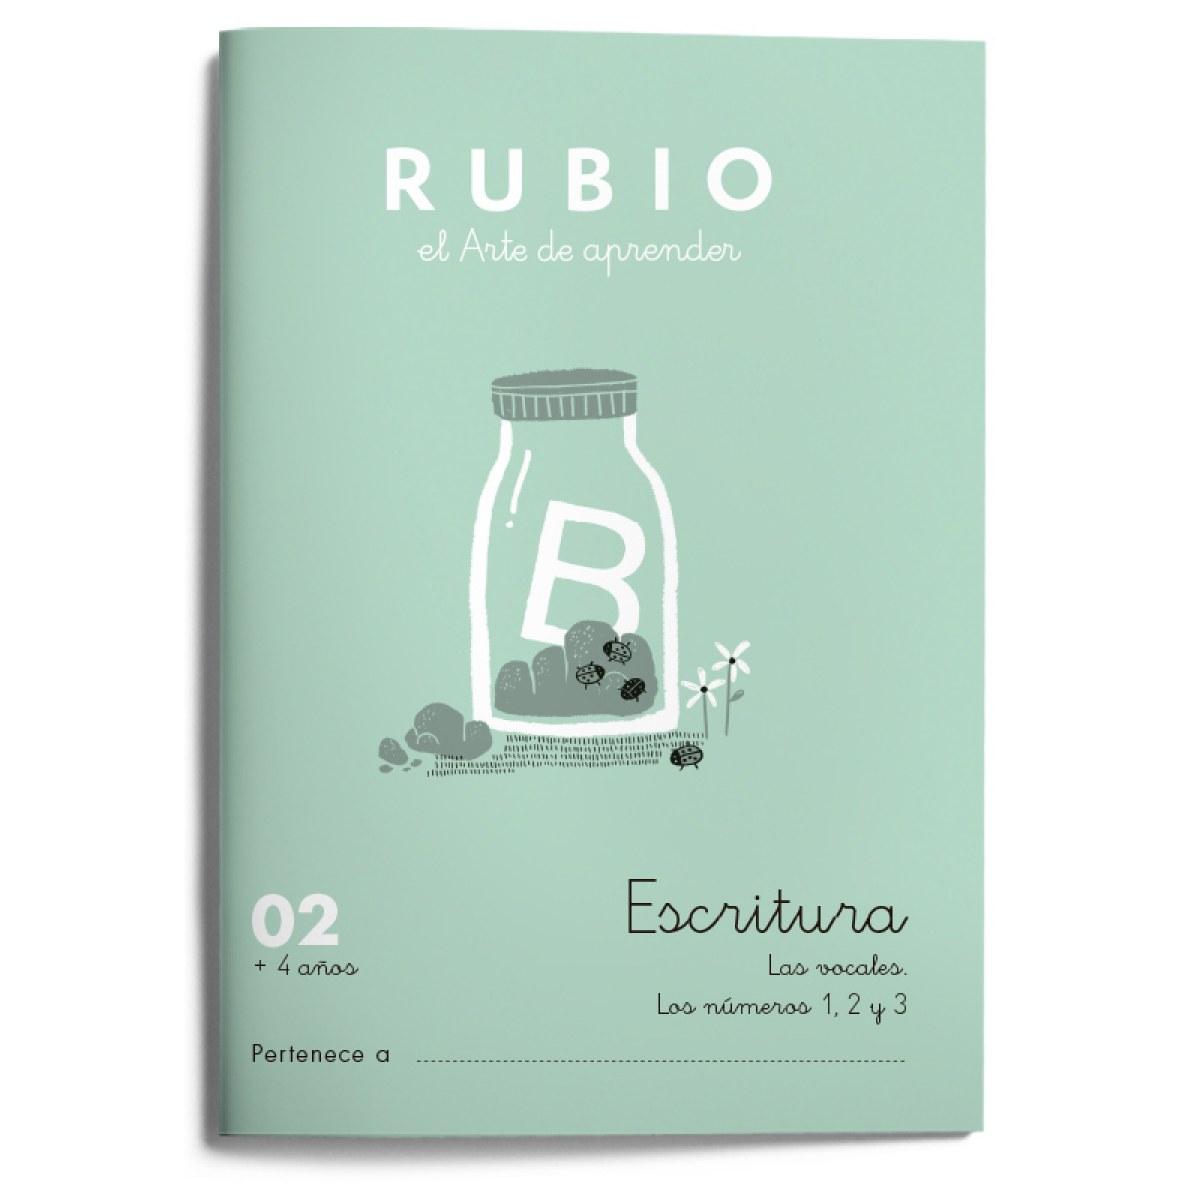 ESCRITURA RUBIO 02